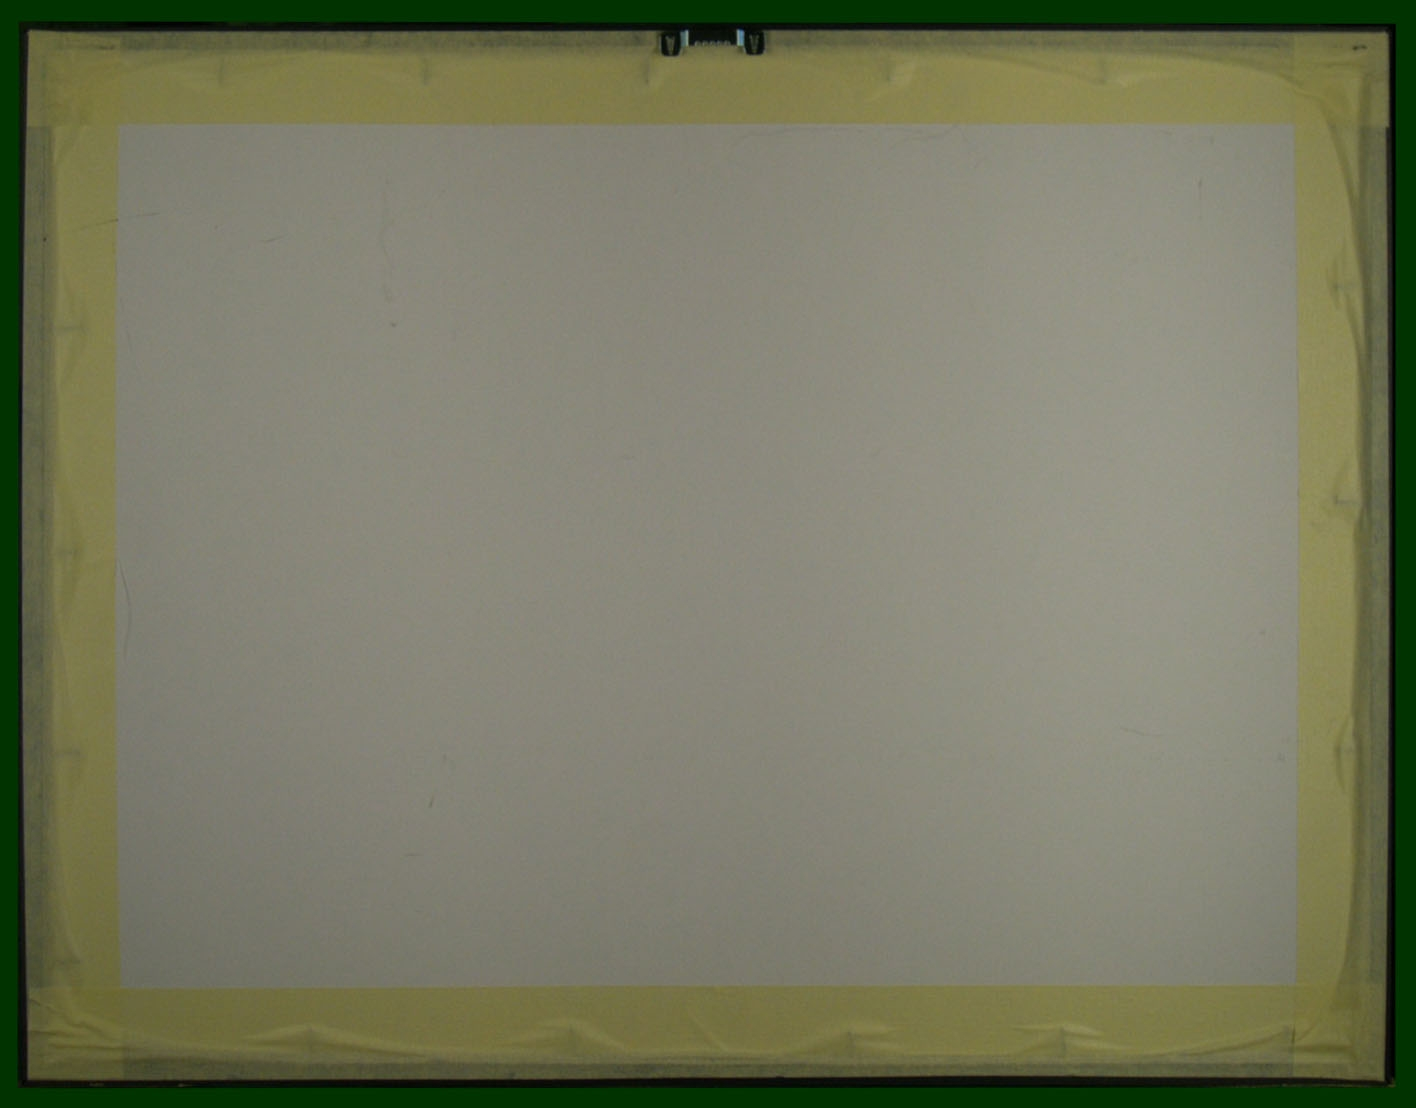 060-012hat.JPG (1416×1108)